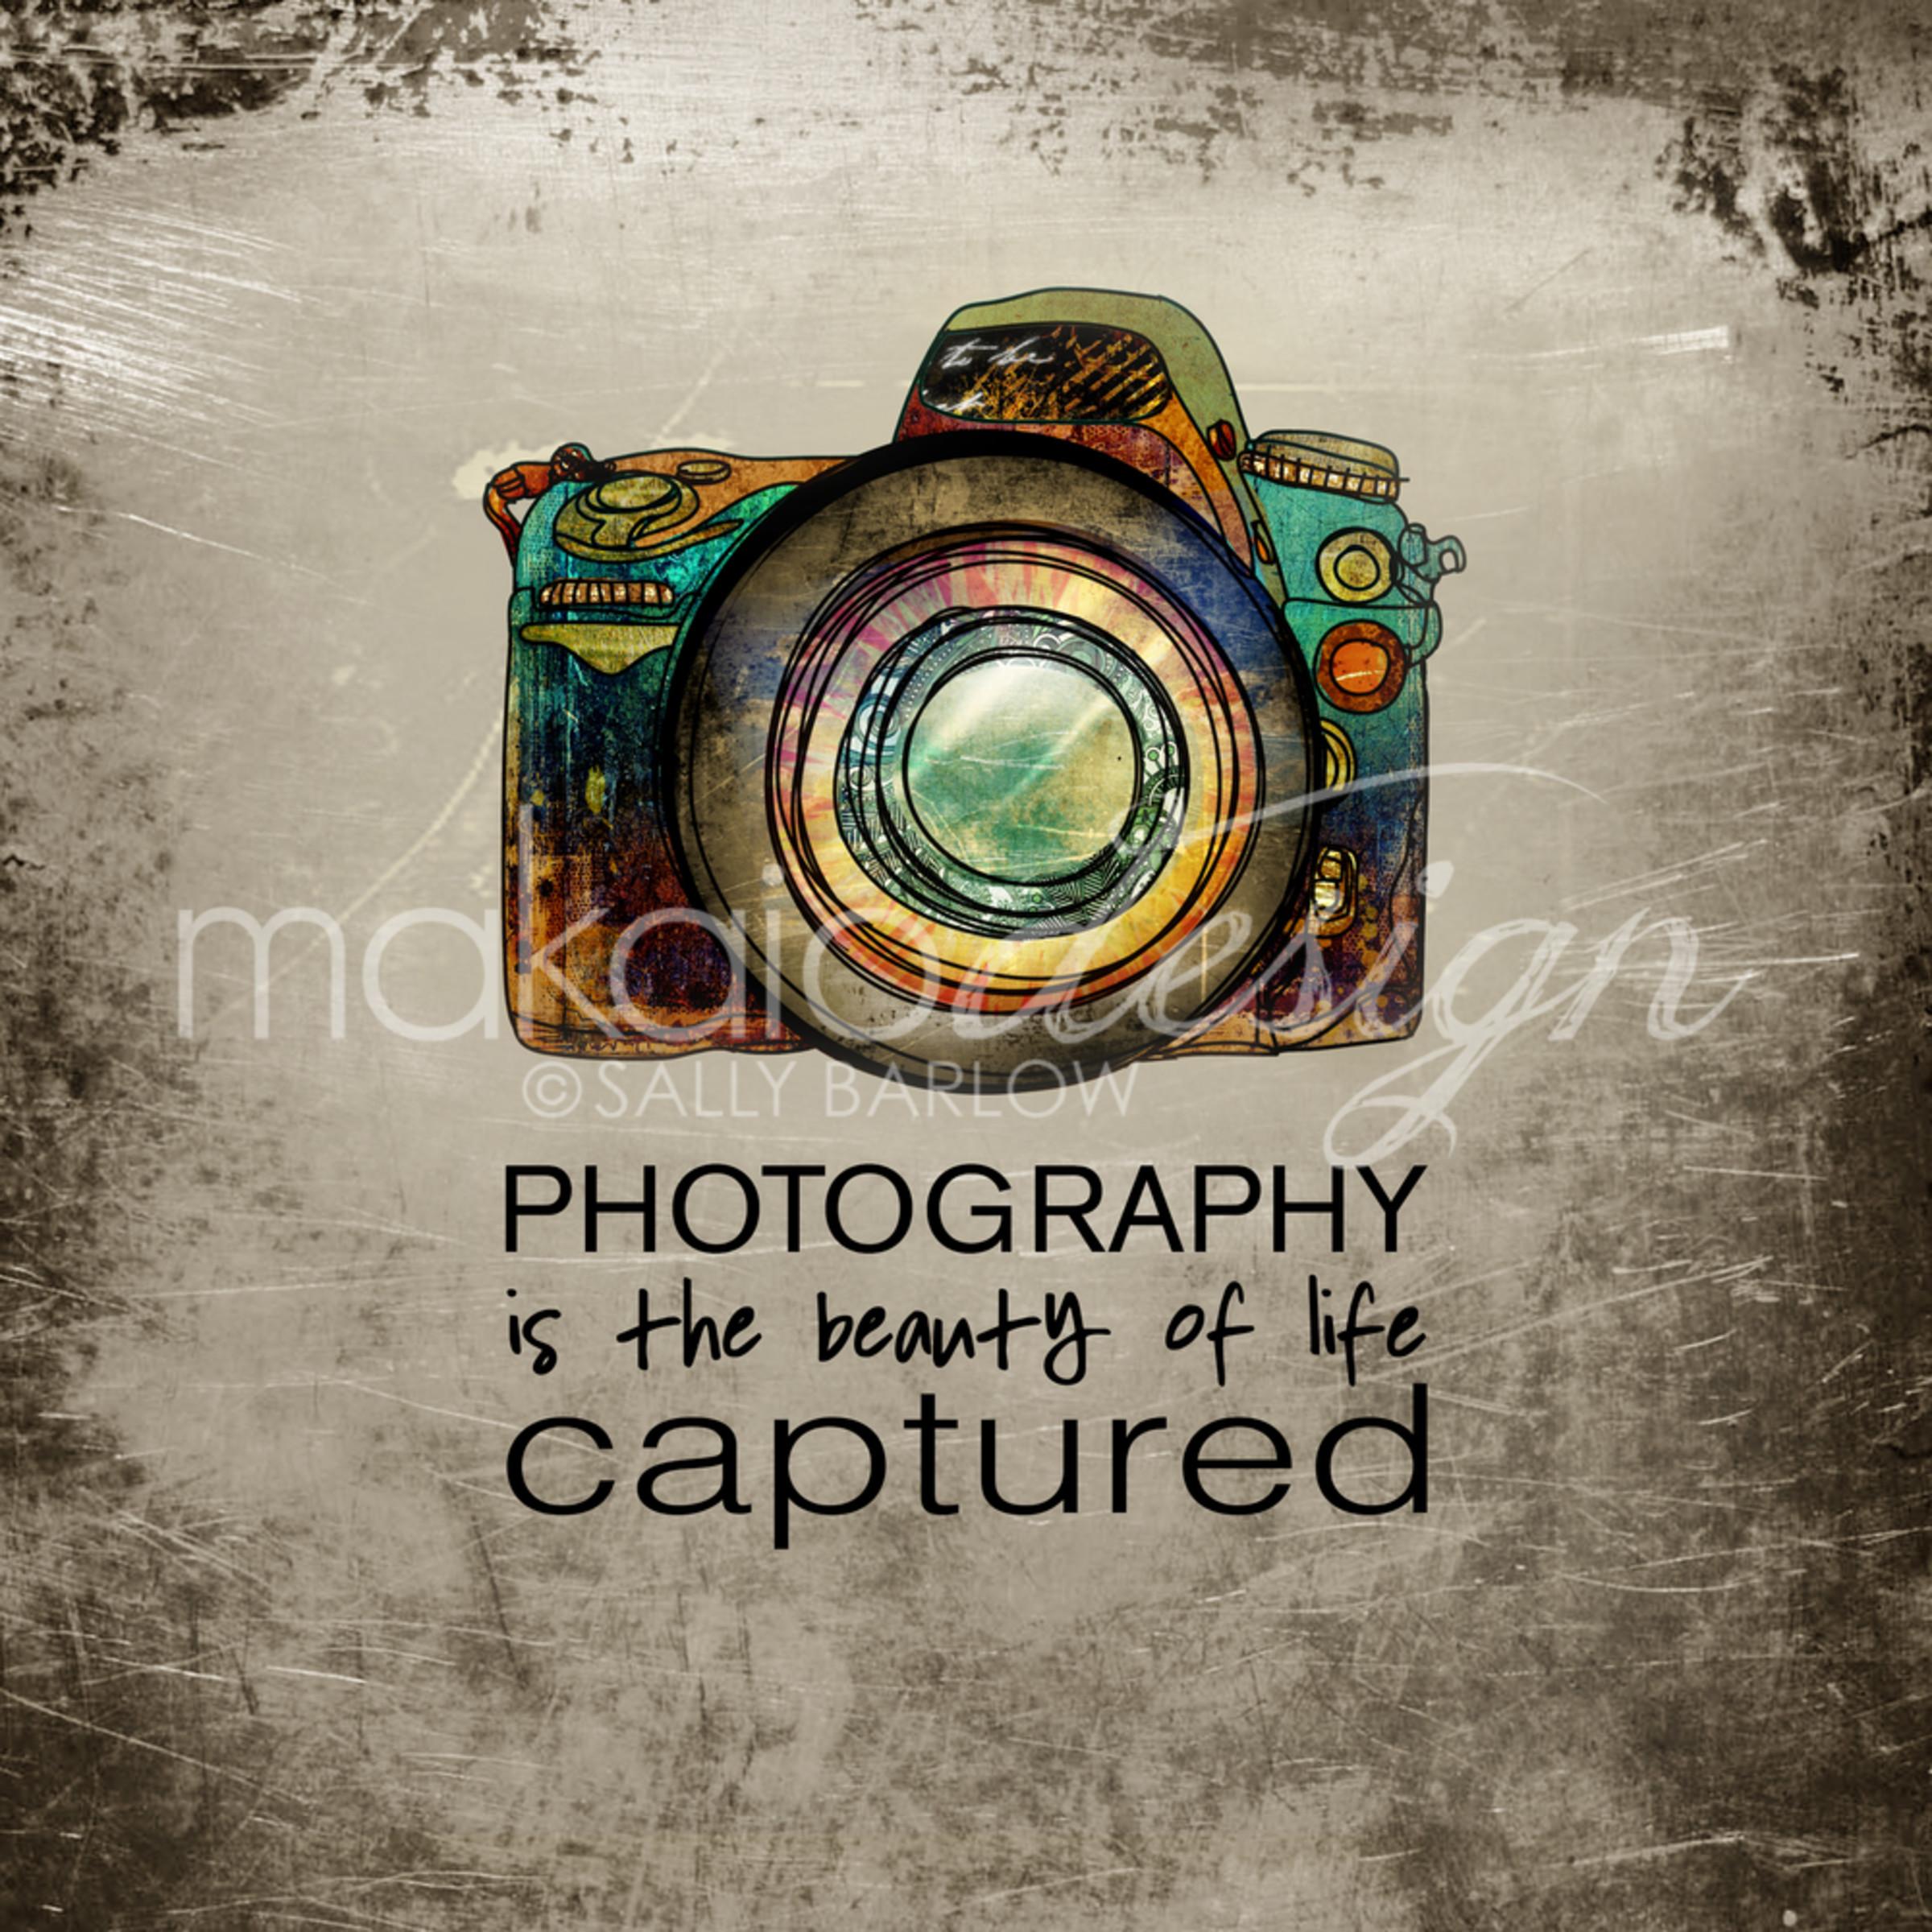 Photographysquare 1 prbvji